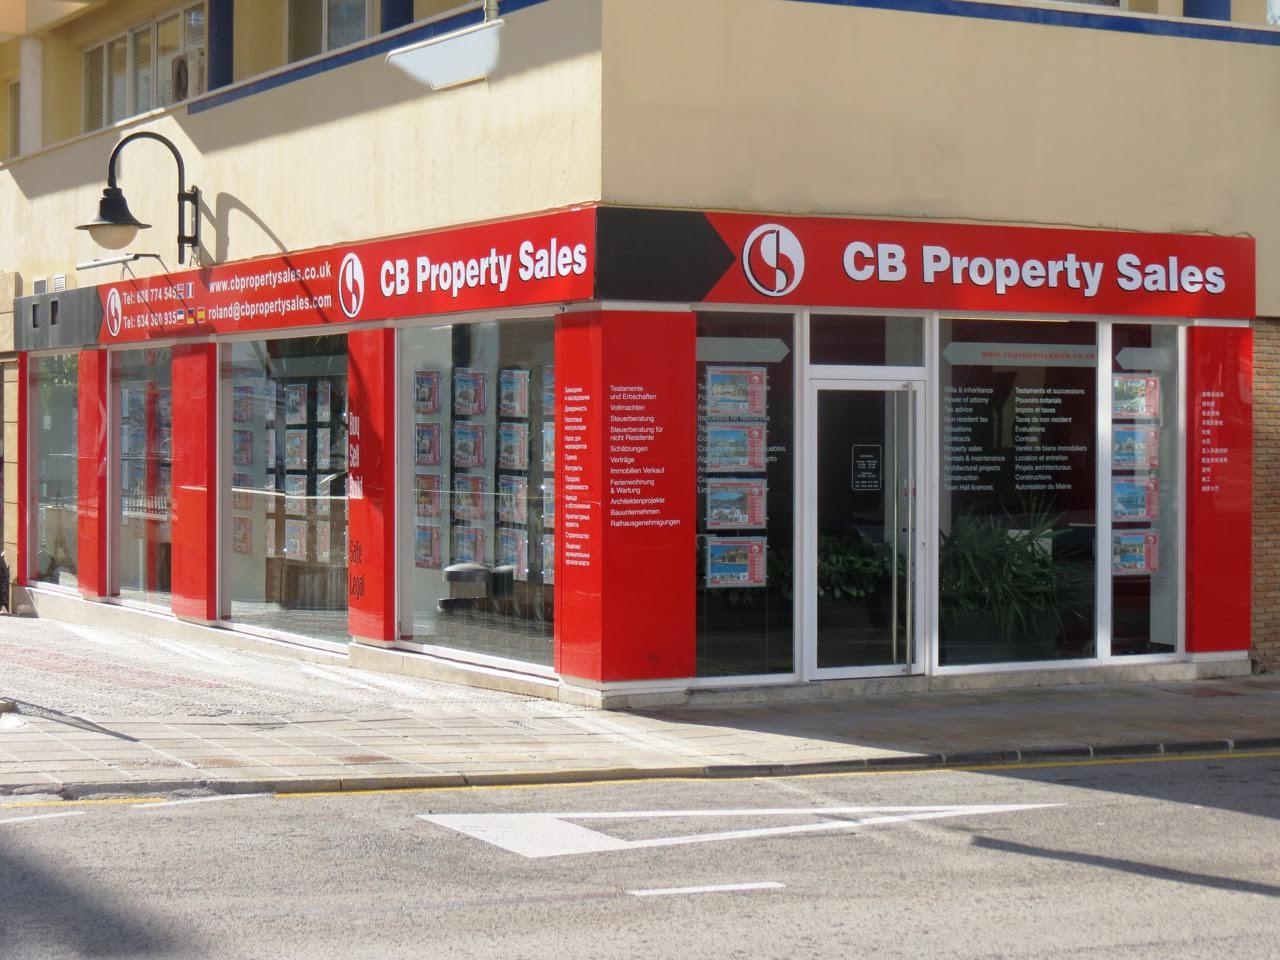 CB Property Sales Moraira